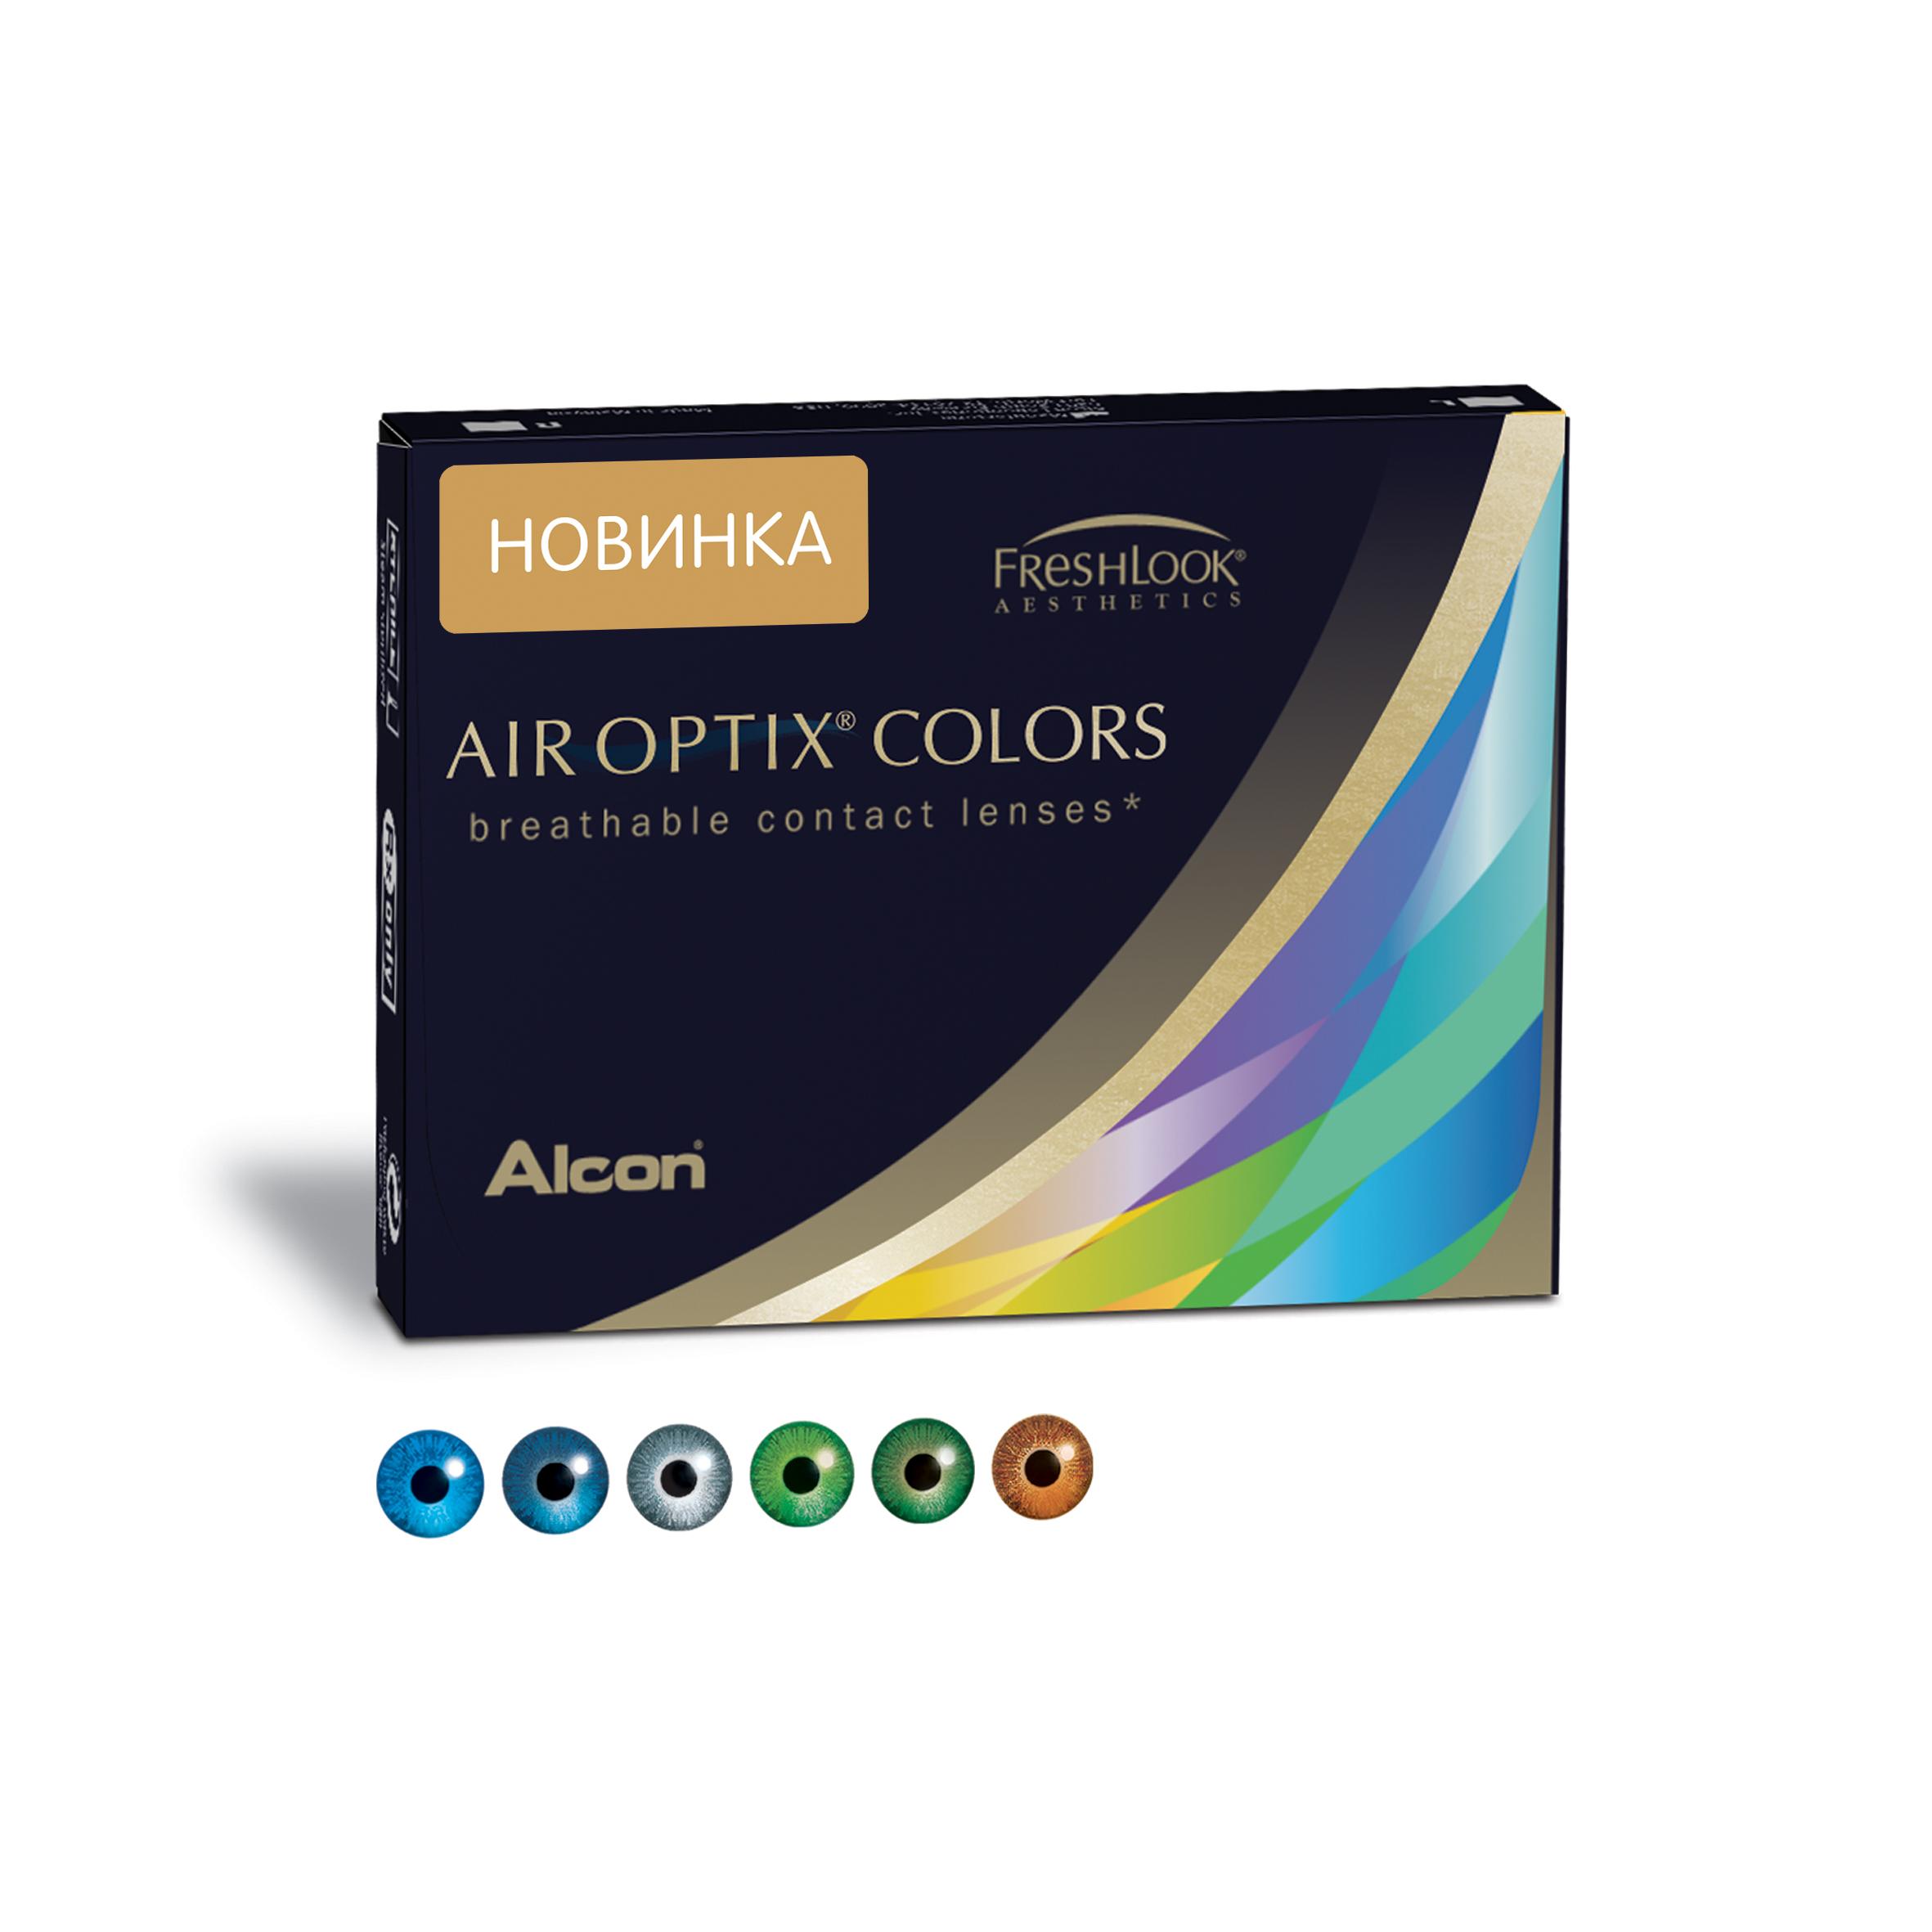 Аlcon контактные линзы Air Optix Colors 2 шт -2.75 Brilliant Blue31746185Мягкие контактные линзы